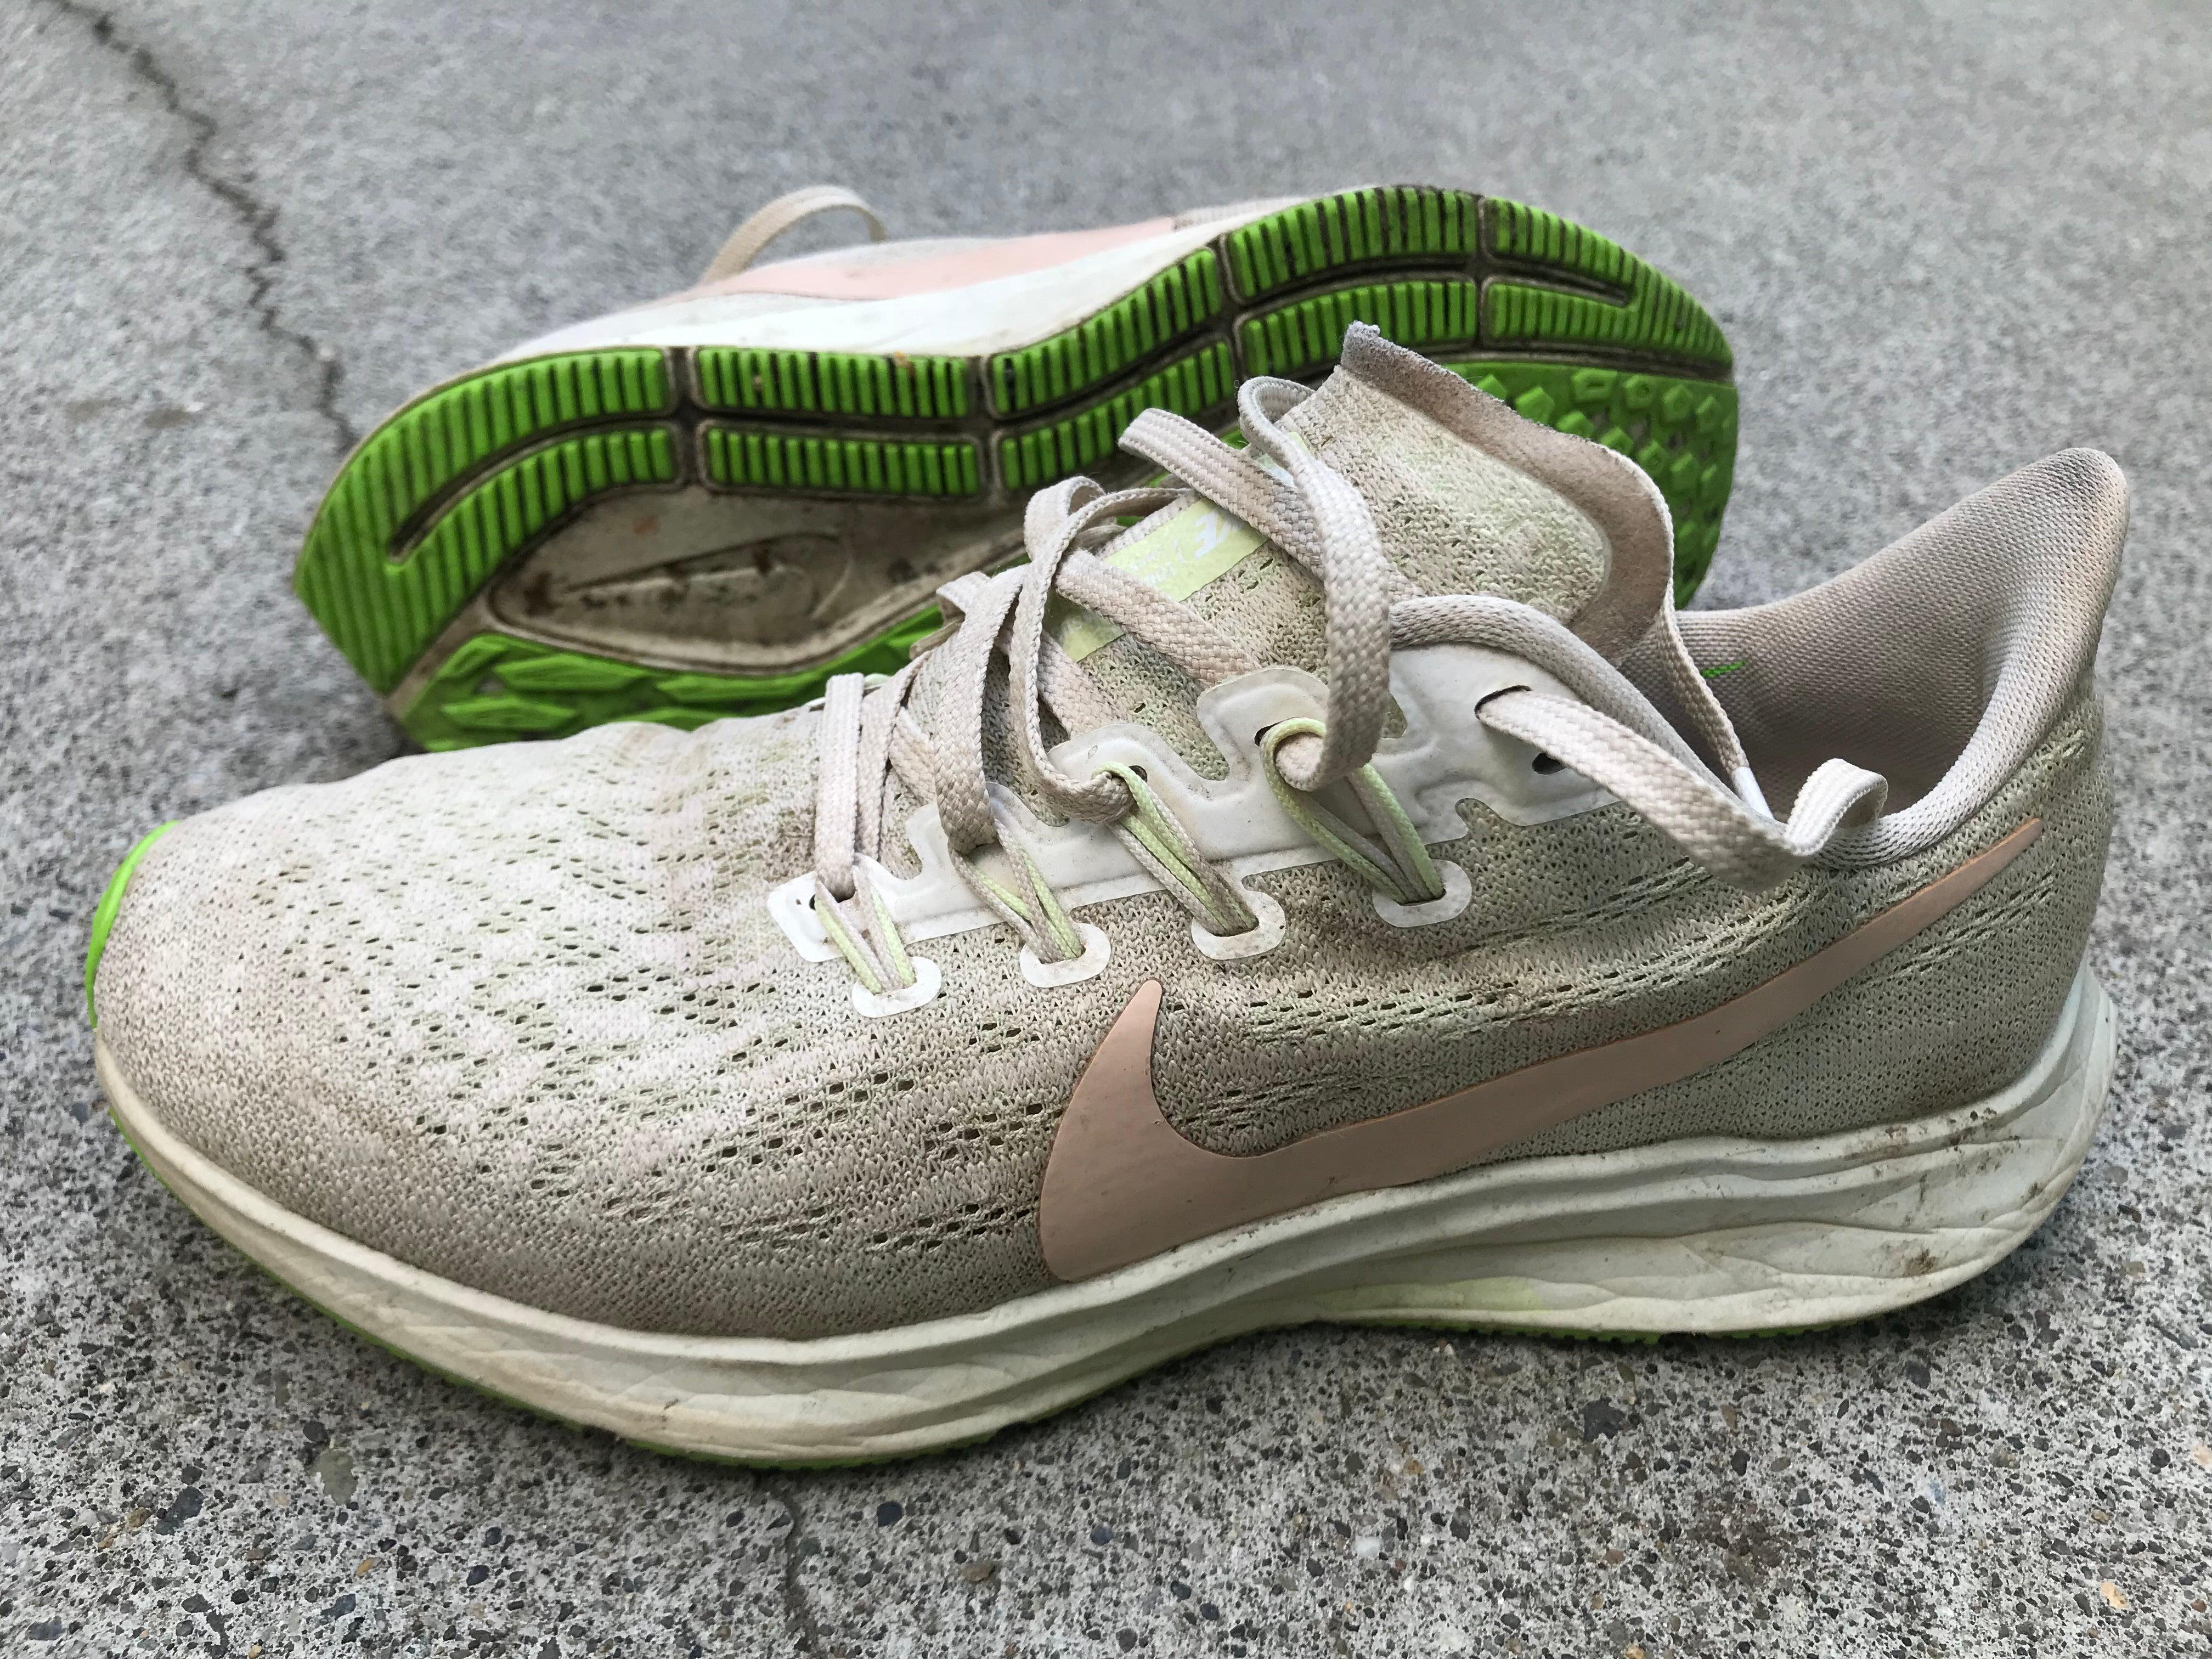 Nike Air Zoom Pegasus 36 worn